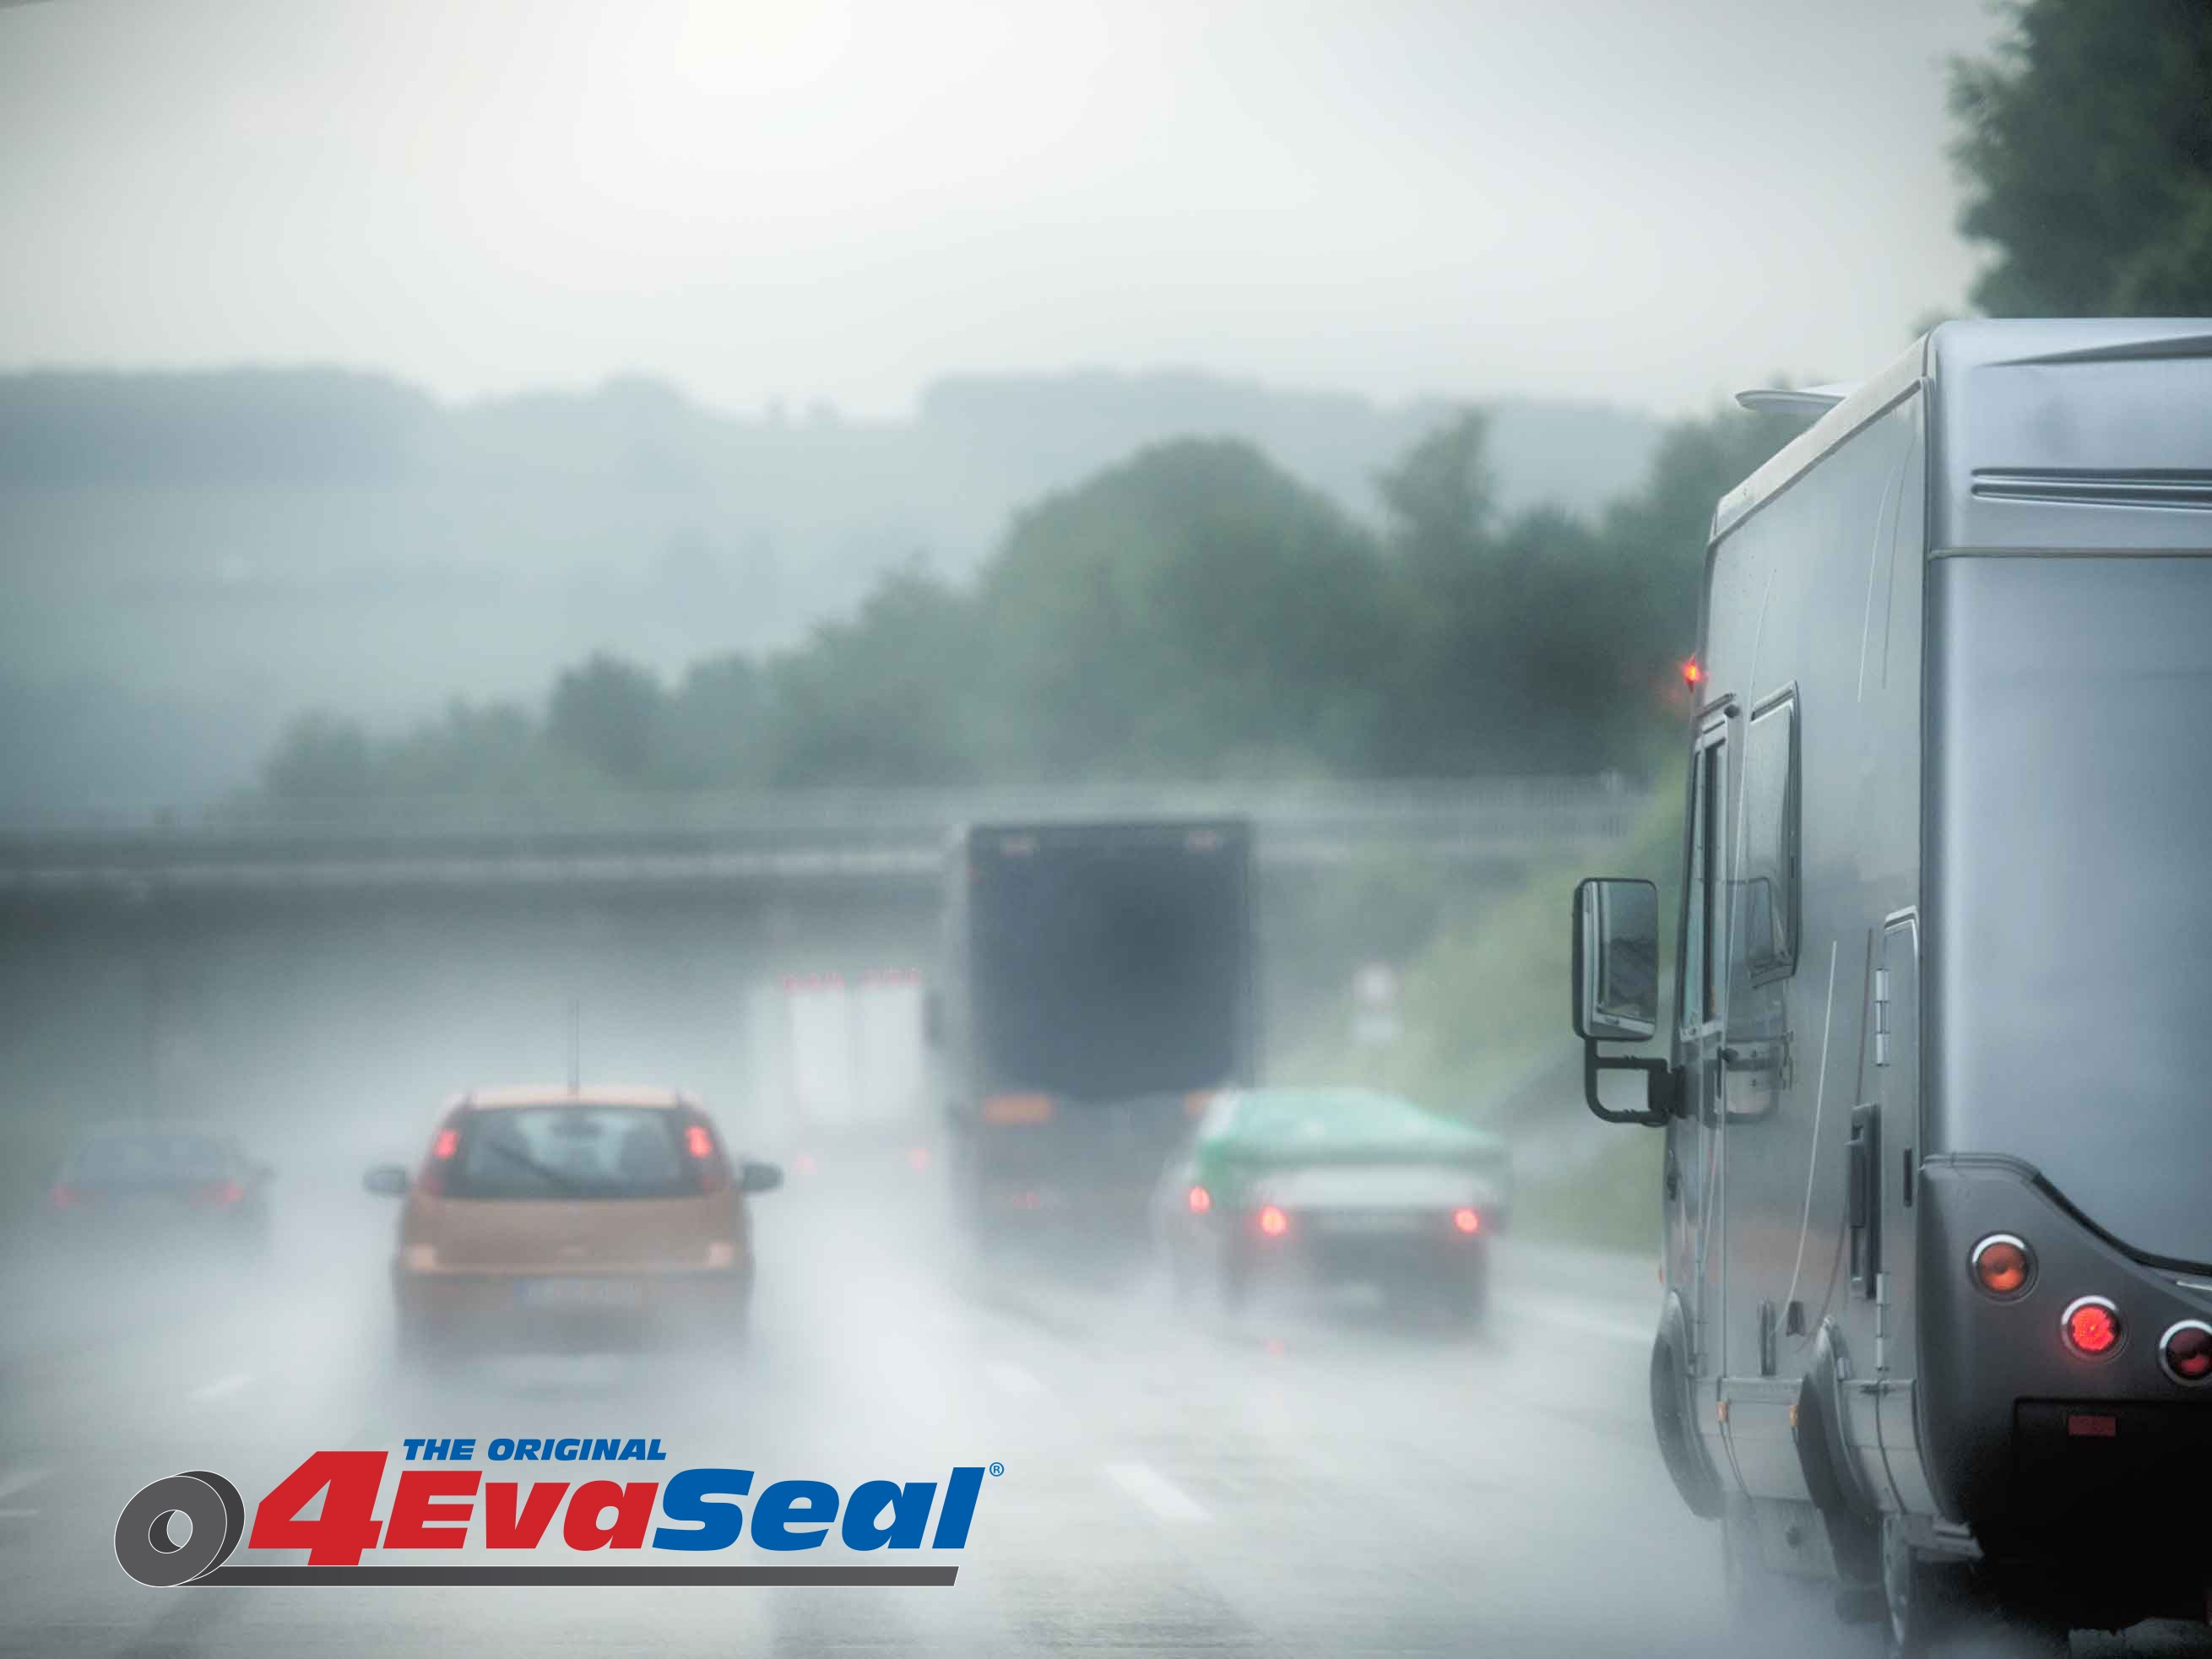 RV-driving-in-the-rain1 copy.jpg